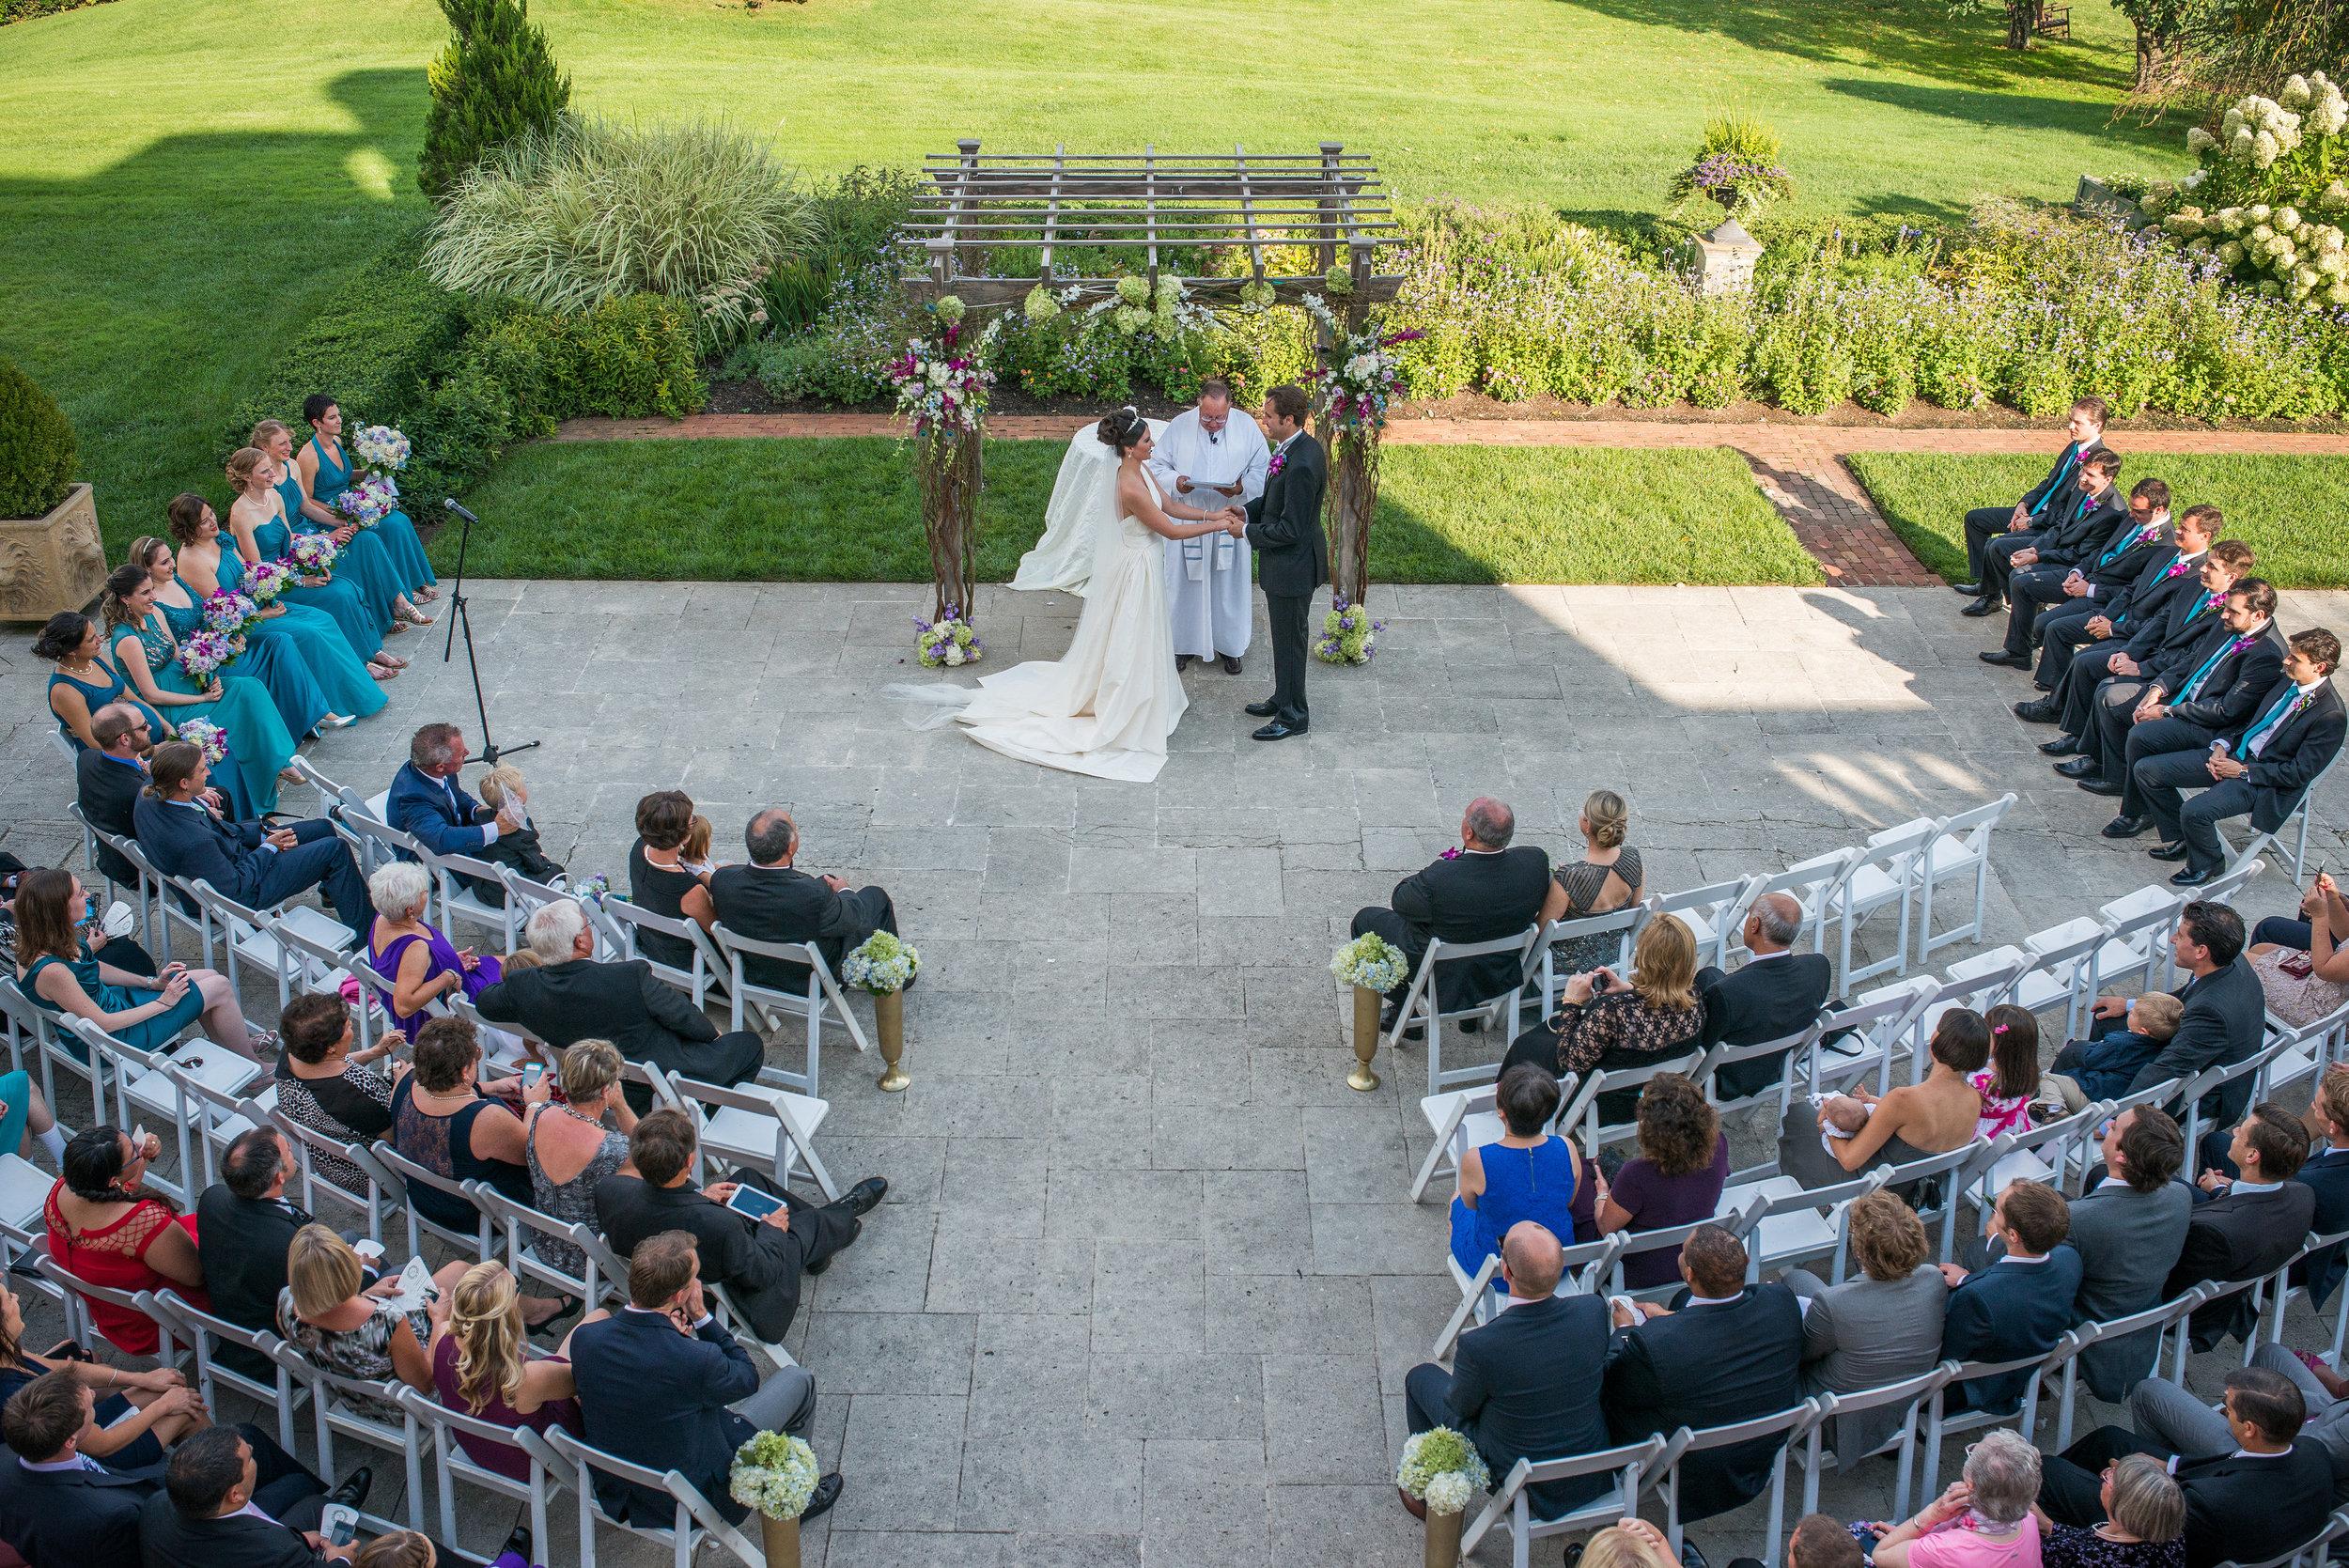 Keswick Hall - Weddings - Rentals and Staging - The AV Company